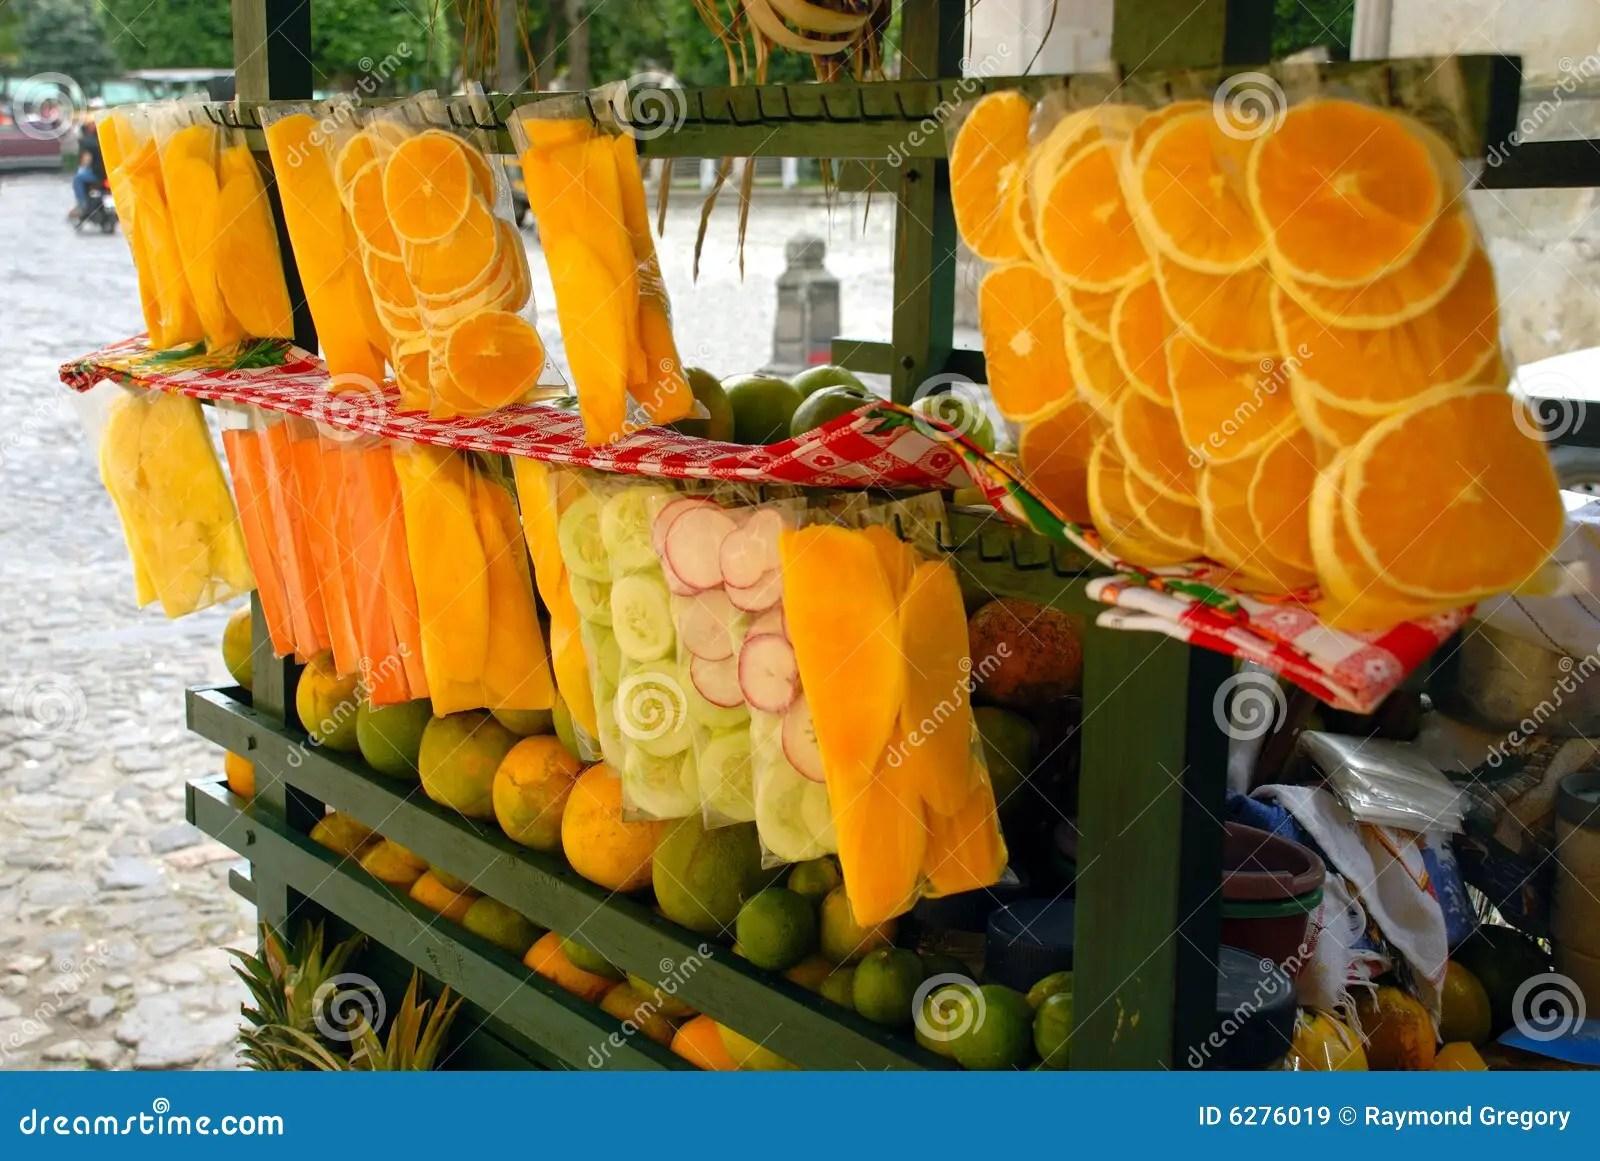 Street Cart Fruit Stand Antigua Guatemala Royalty Free